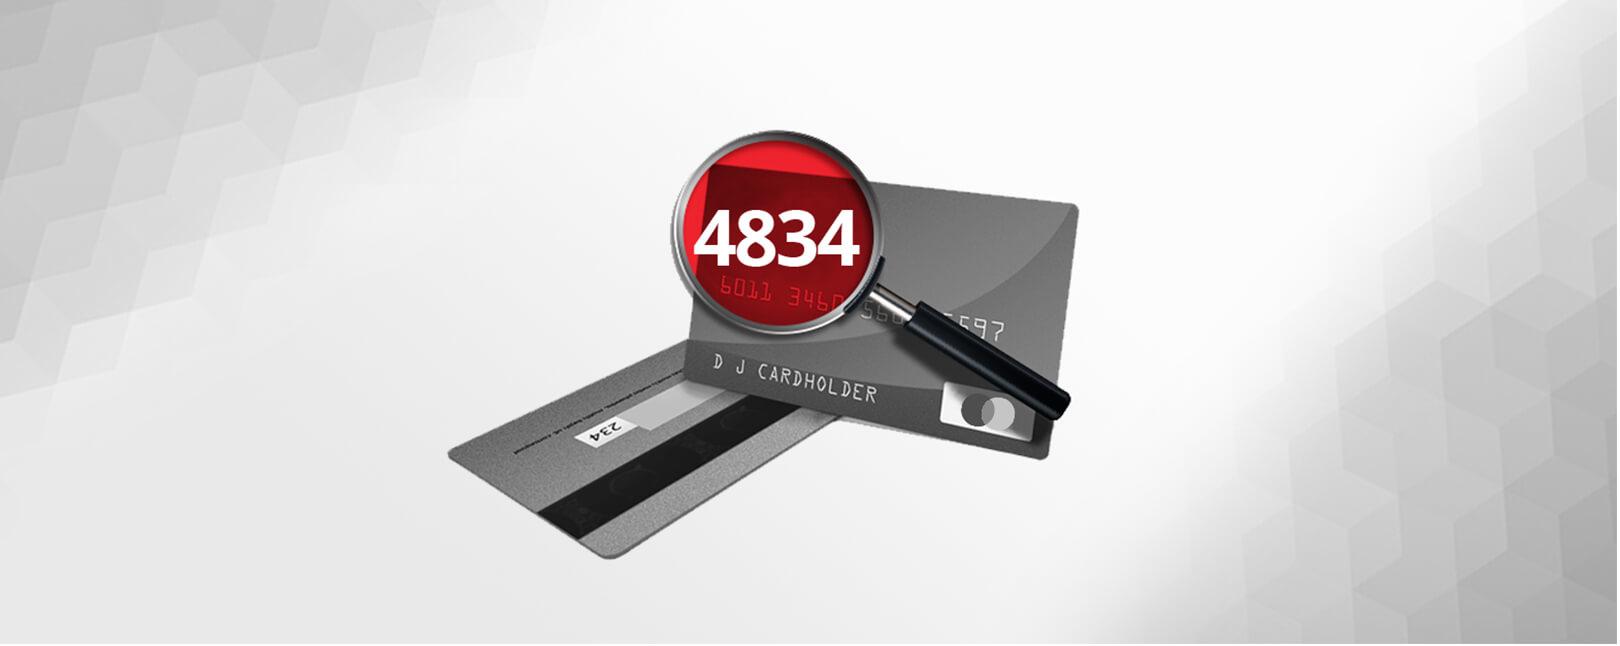 4834- Late Presentment